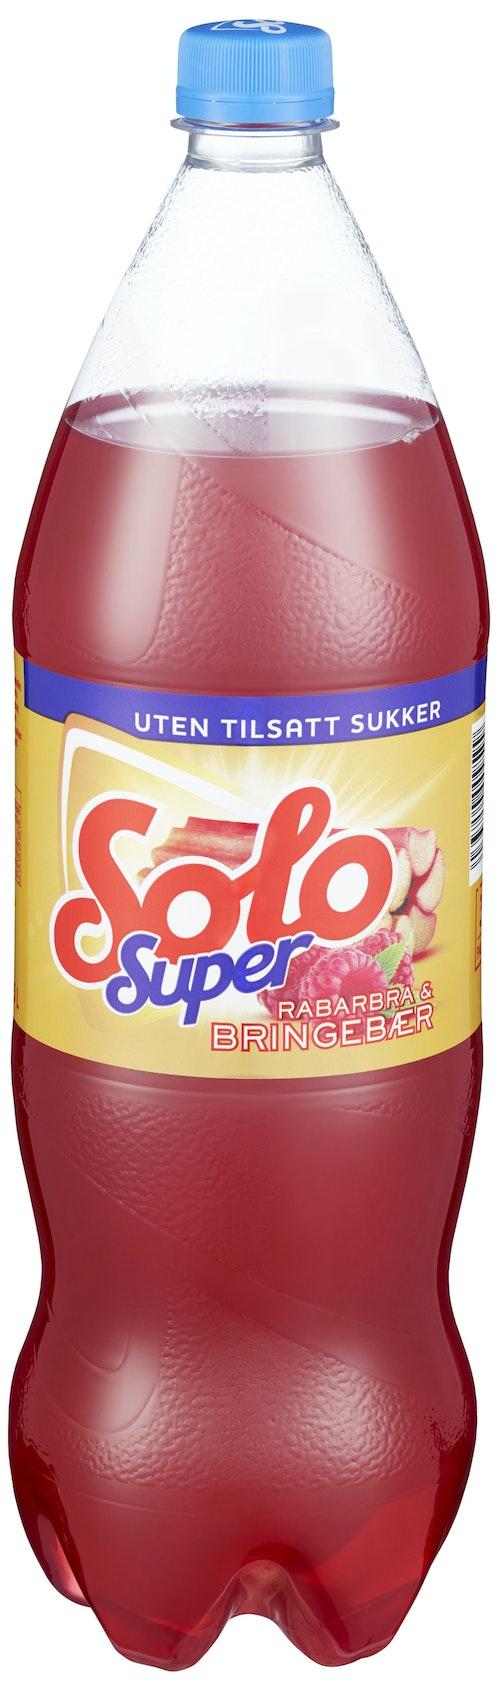 Solo Solo Super Rabarbra & Bringebær 1,5 l